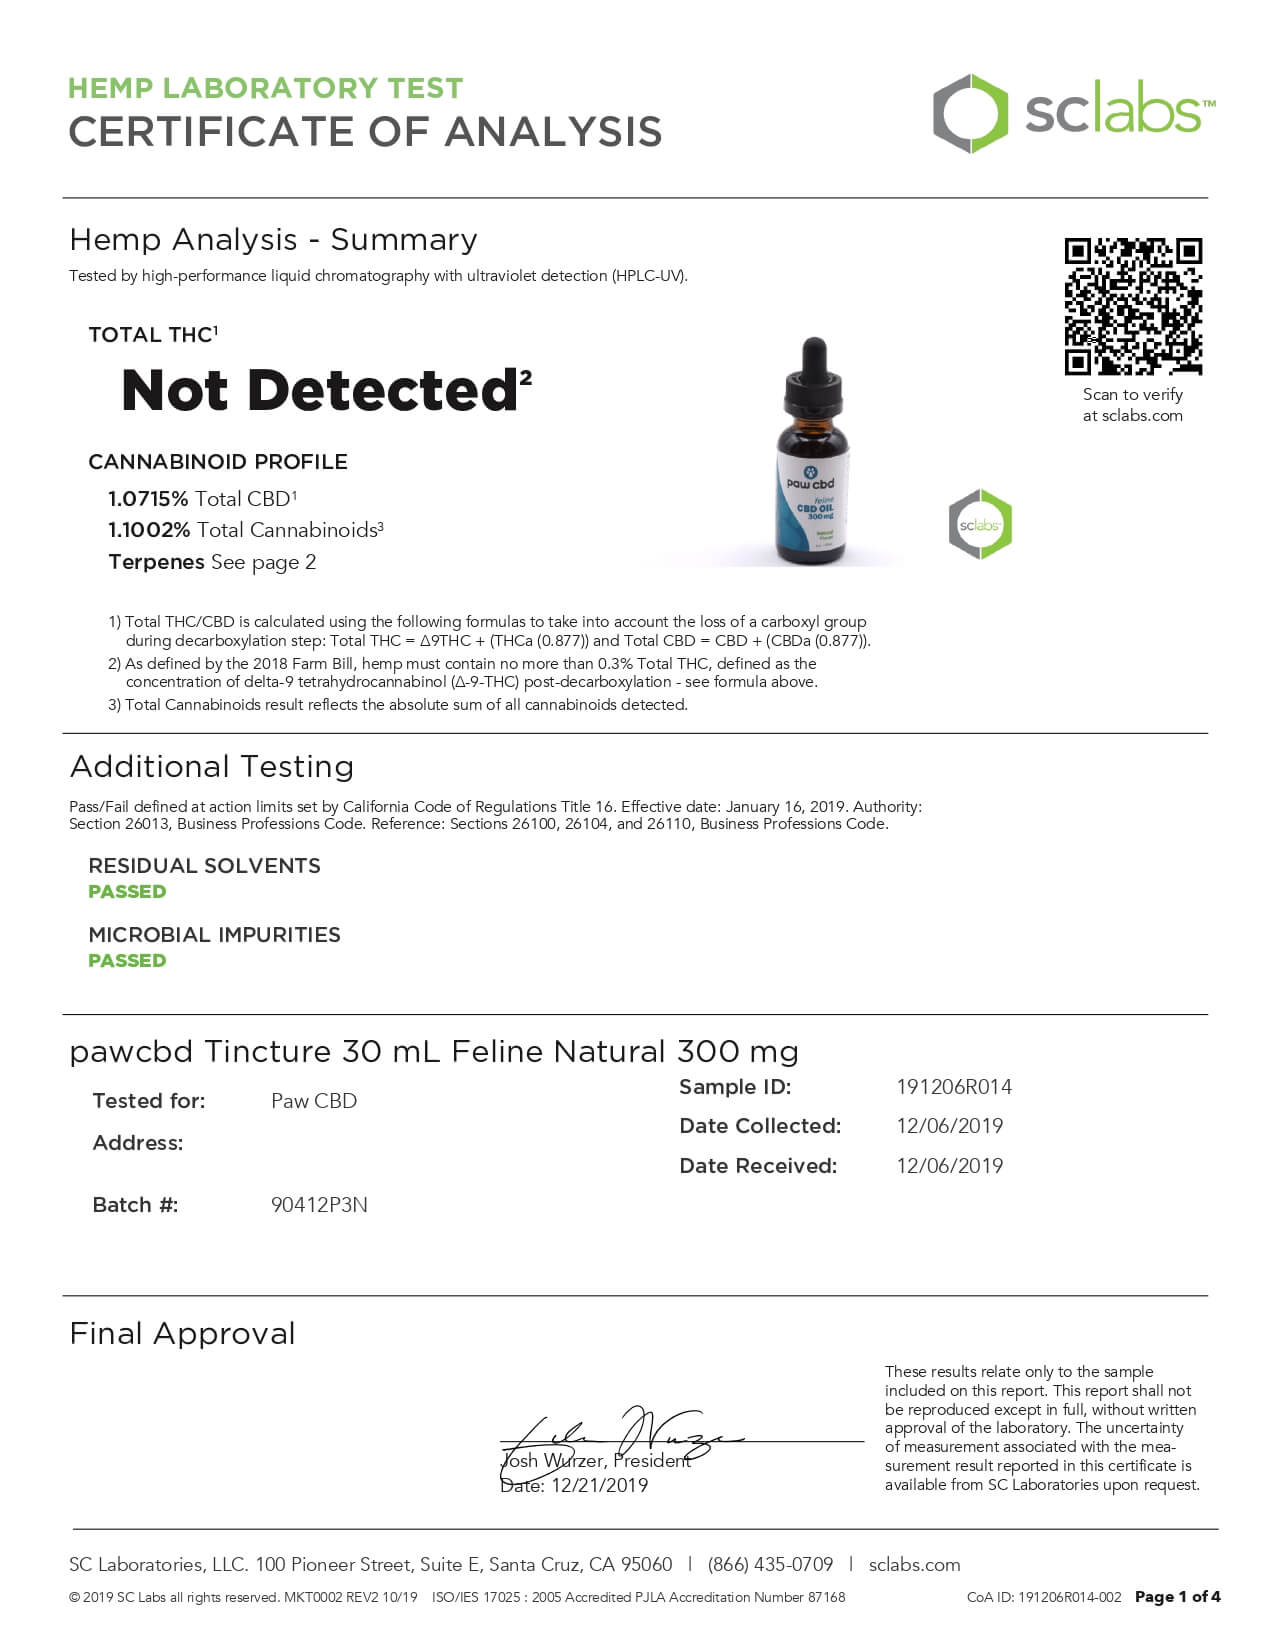 cbdMD CBD Pet Tincture Natural Flavored Feline 300mg Lab Report